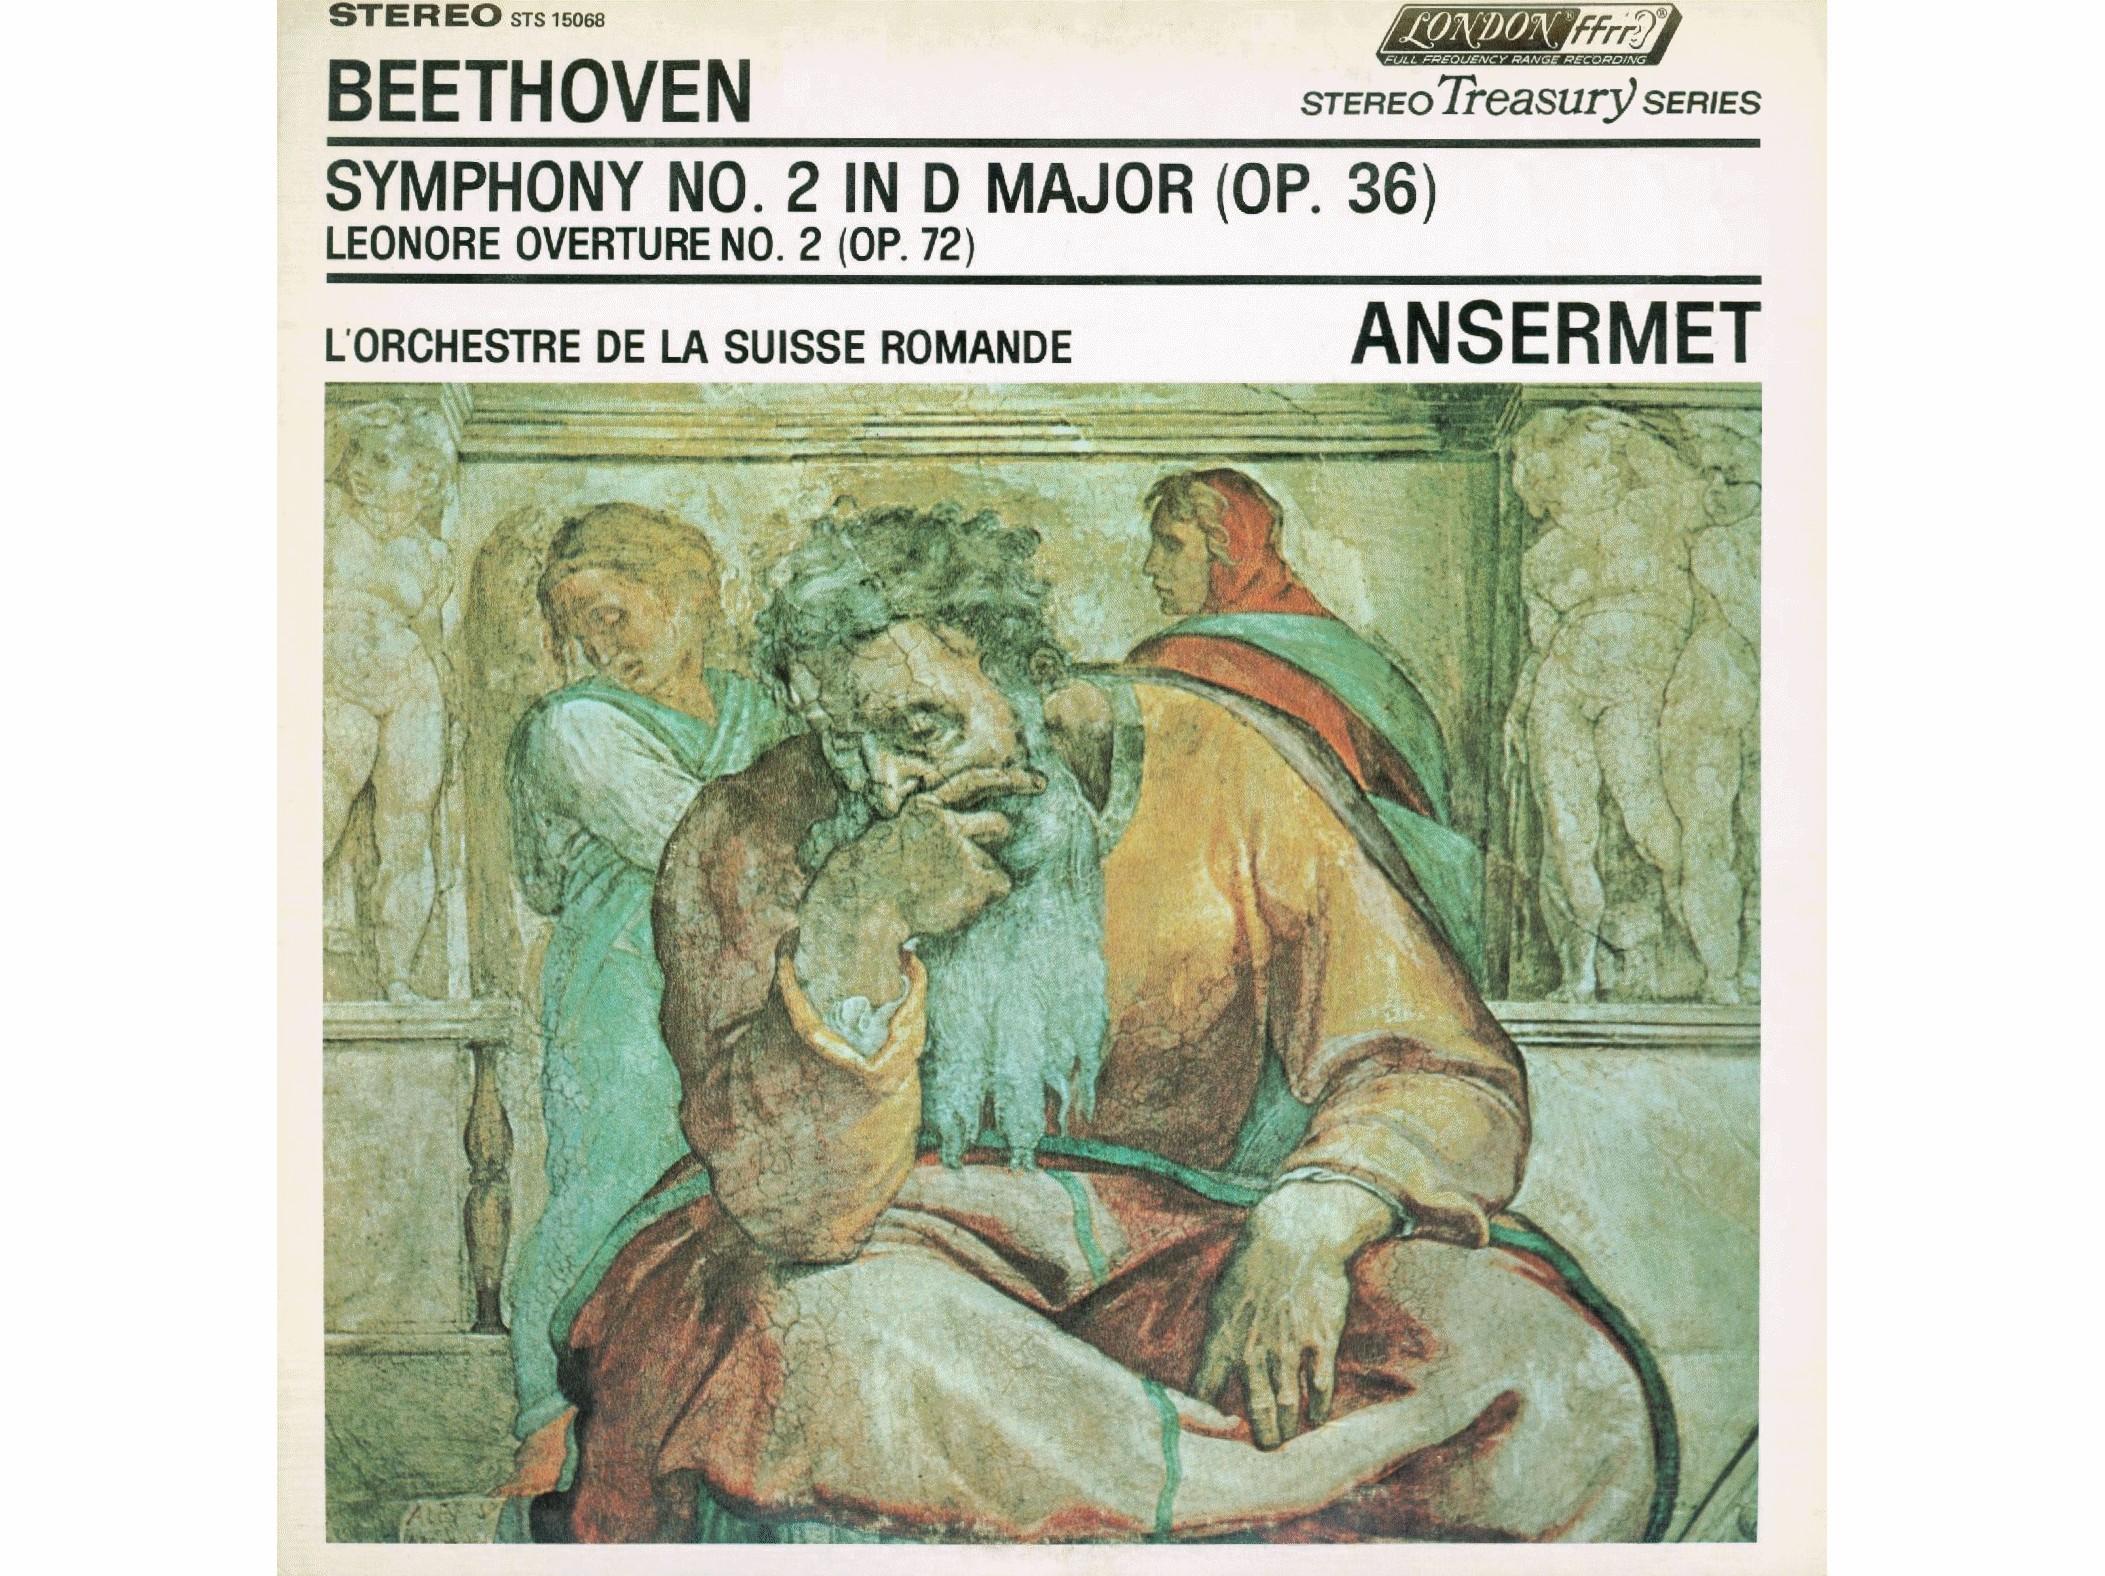 L. van Beethoven, Ouv. Leonore II, Op.72a, OSR, Ernest Ansermet, 01/1960, disque STS-15068